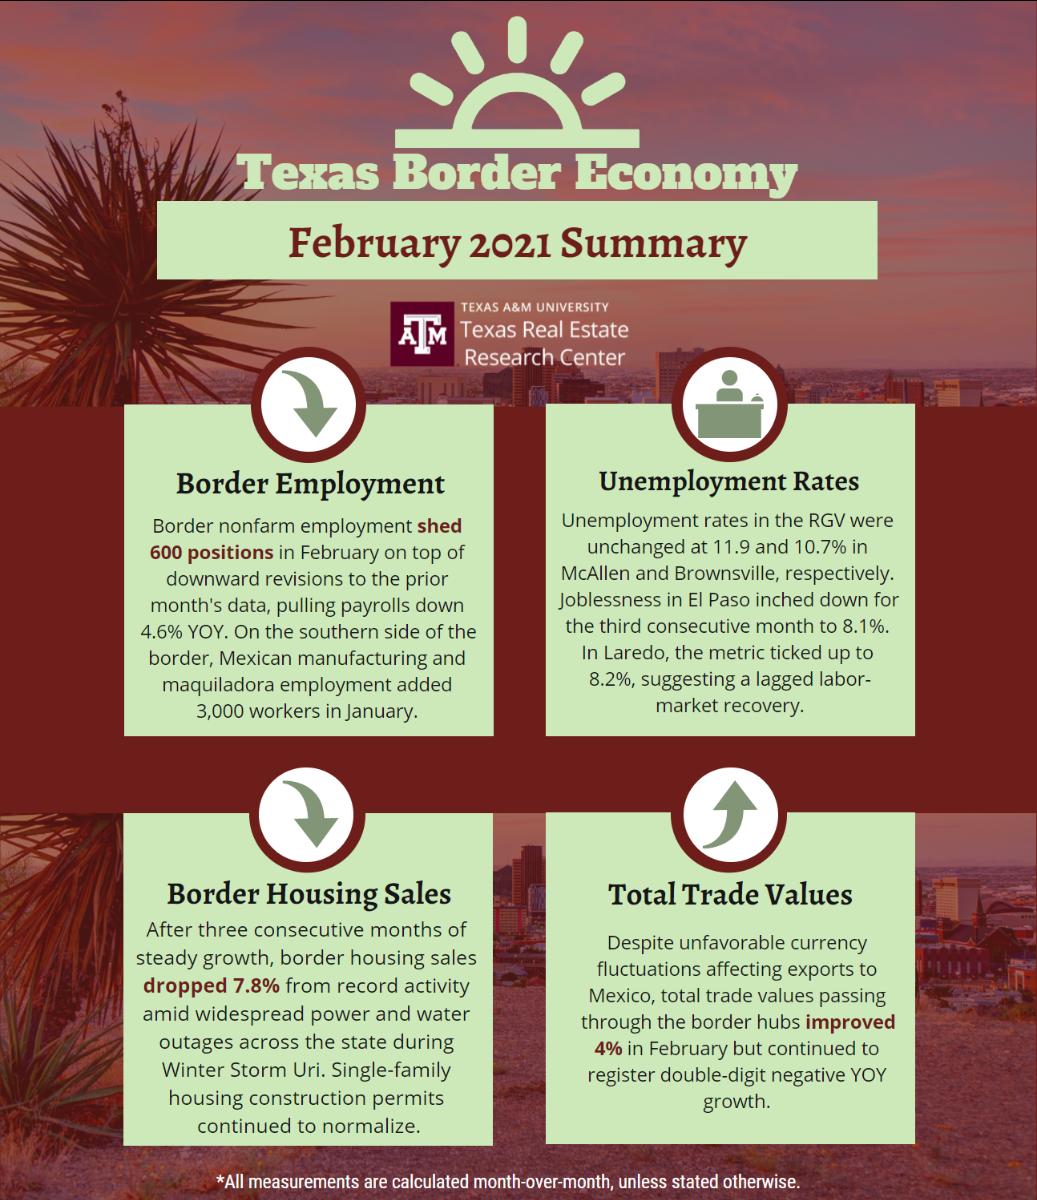 Texas Border Economy February 2021